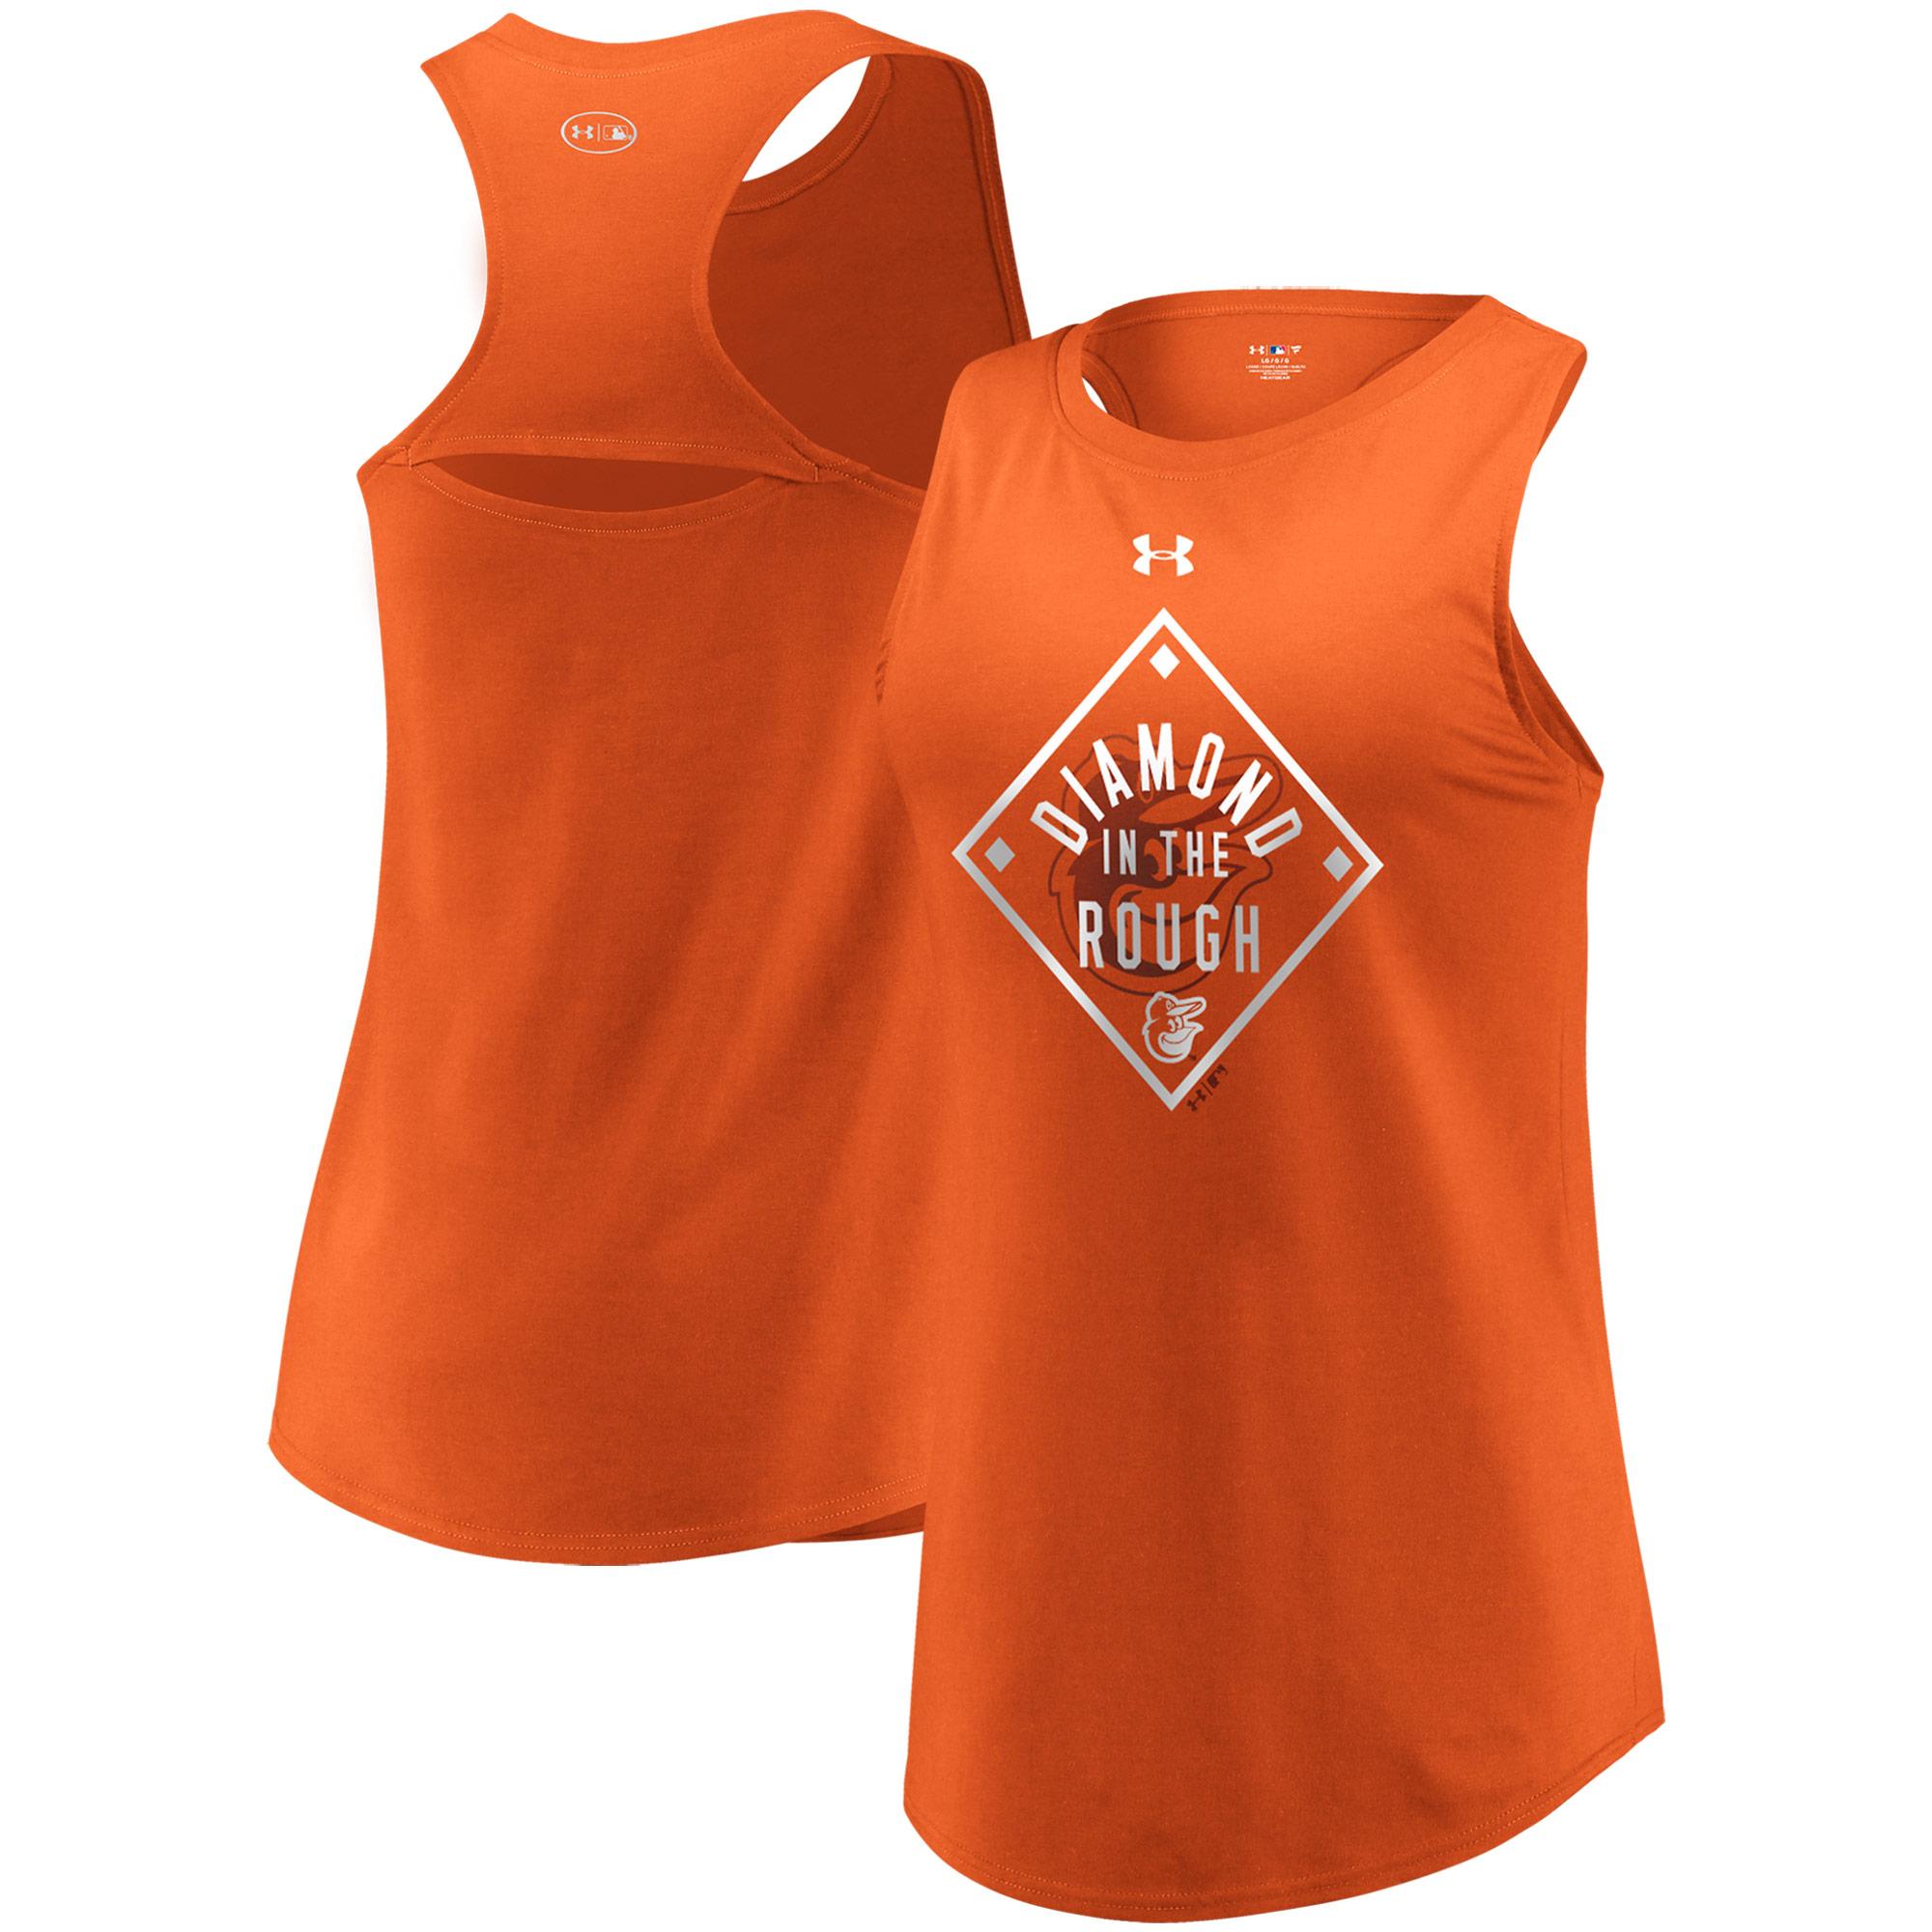 Baltimore Orioles Under Armour Women's Passion Diamond Tri-Blend Performance Tank Top Orange by MAJESTIC LSG